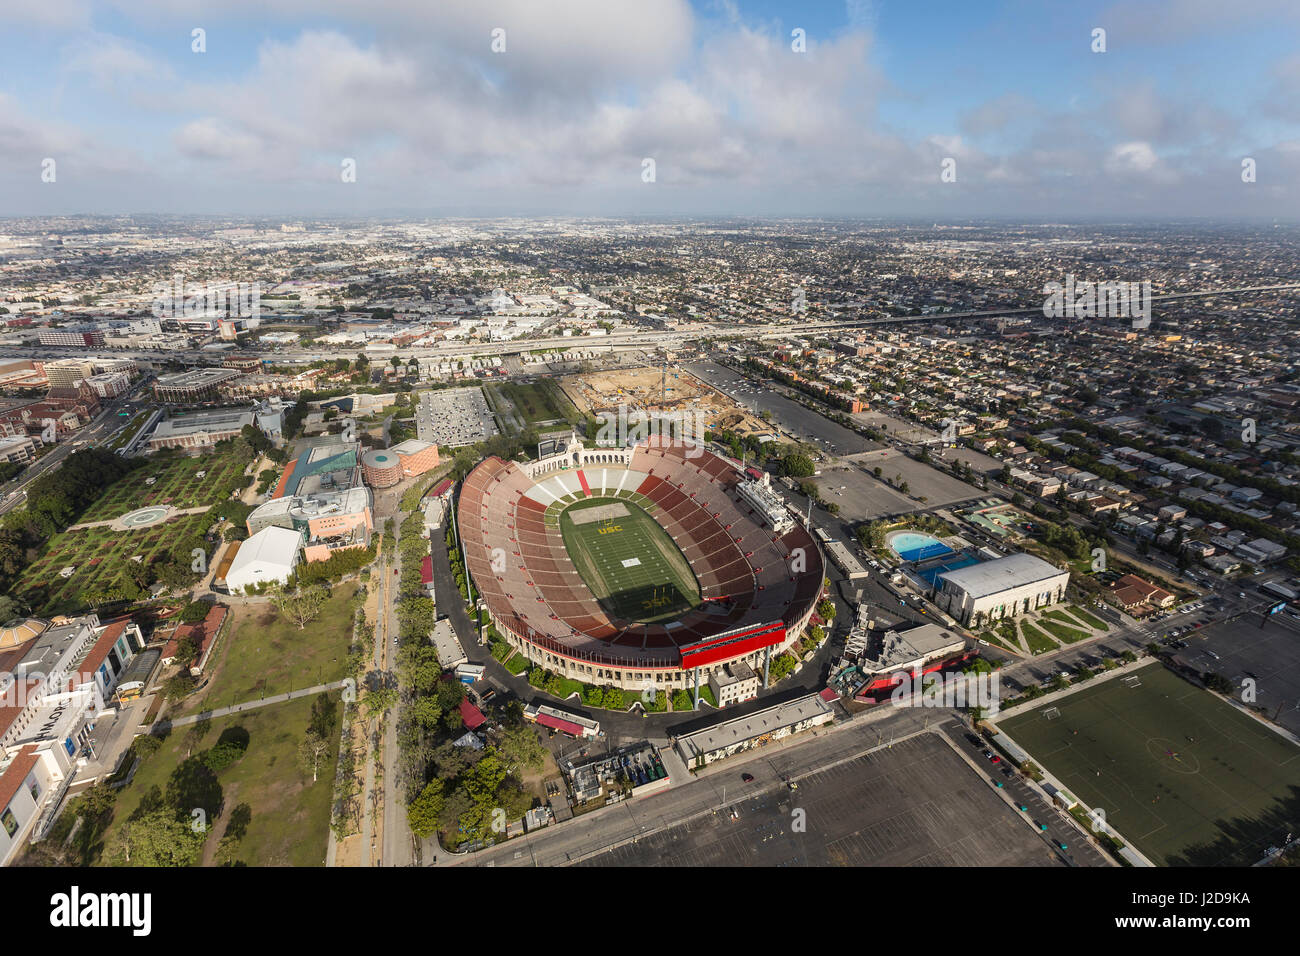 Los Angeles, California, USA - April 12, 2017:  Aerial view of the historic Coliseum stadium near the University - Stock Image